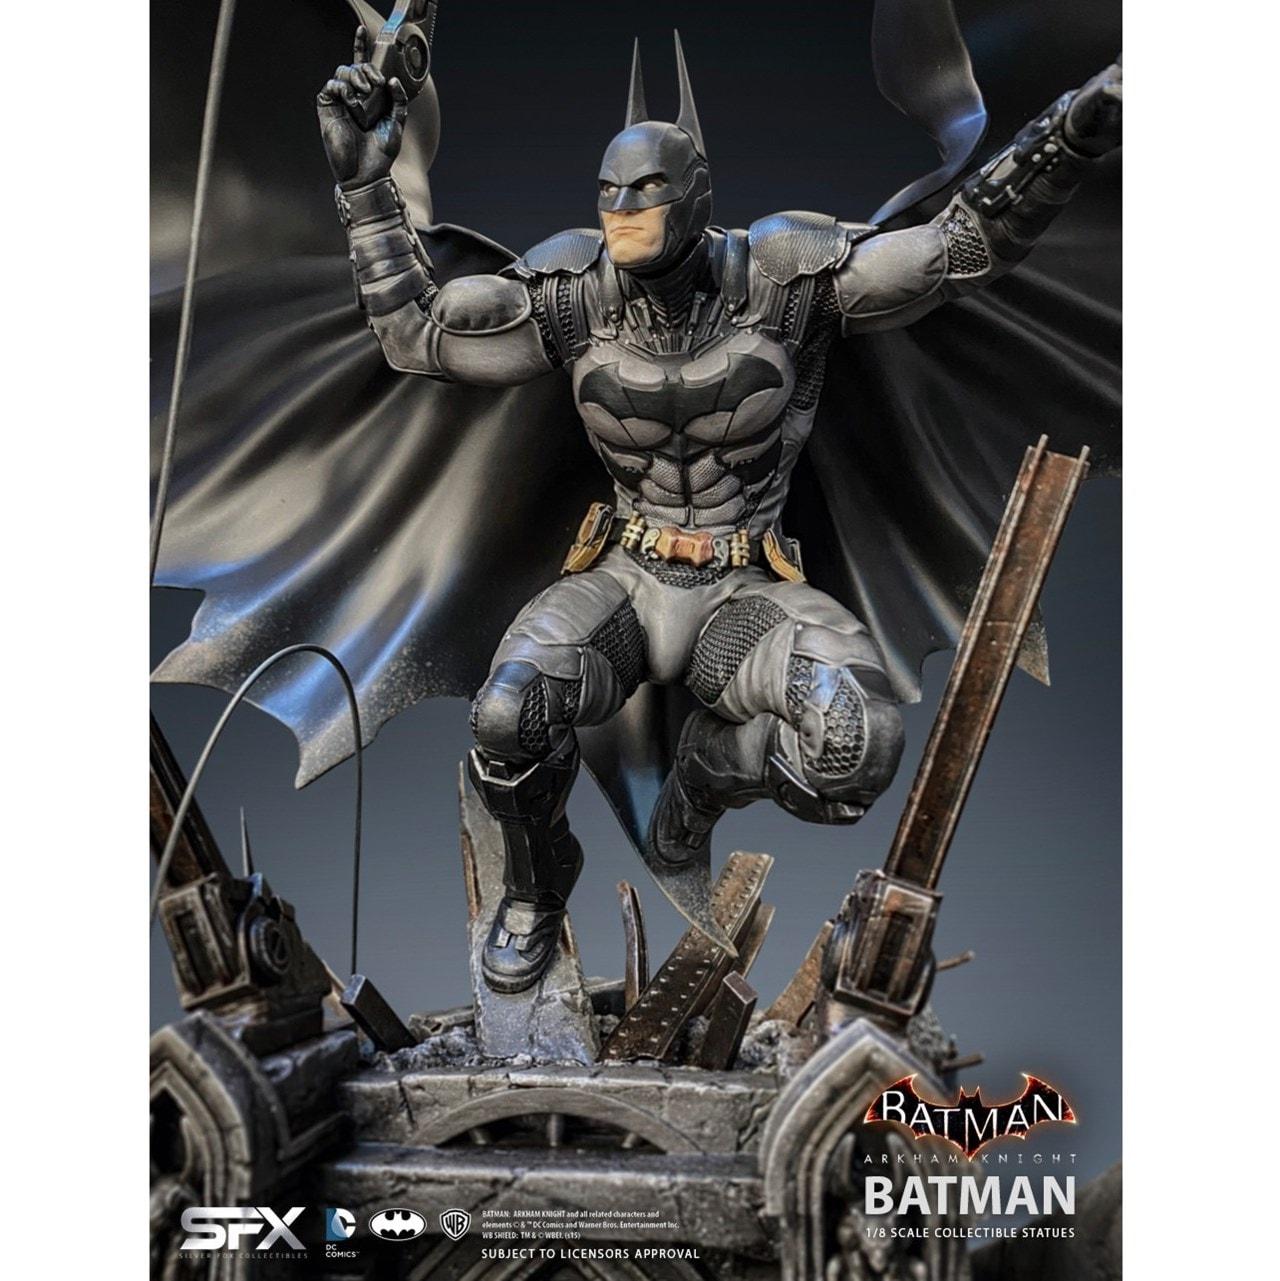 Batman: Arkham Knight Collectible Statue - 4